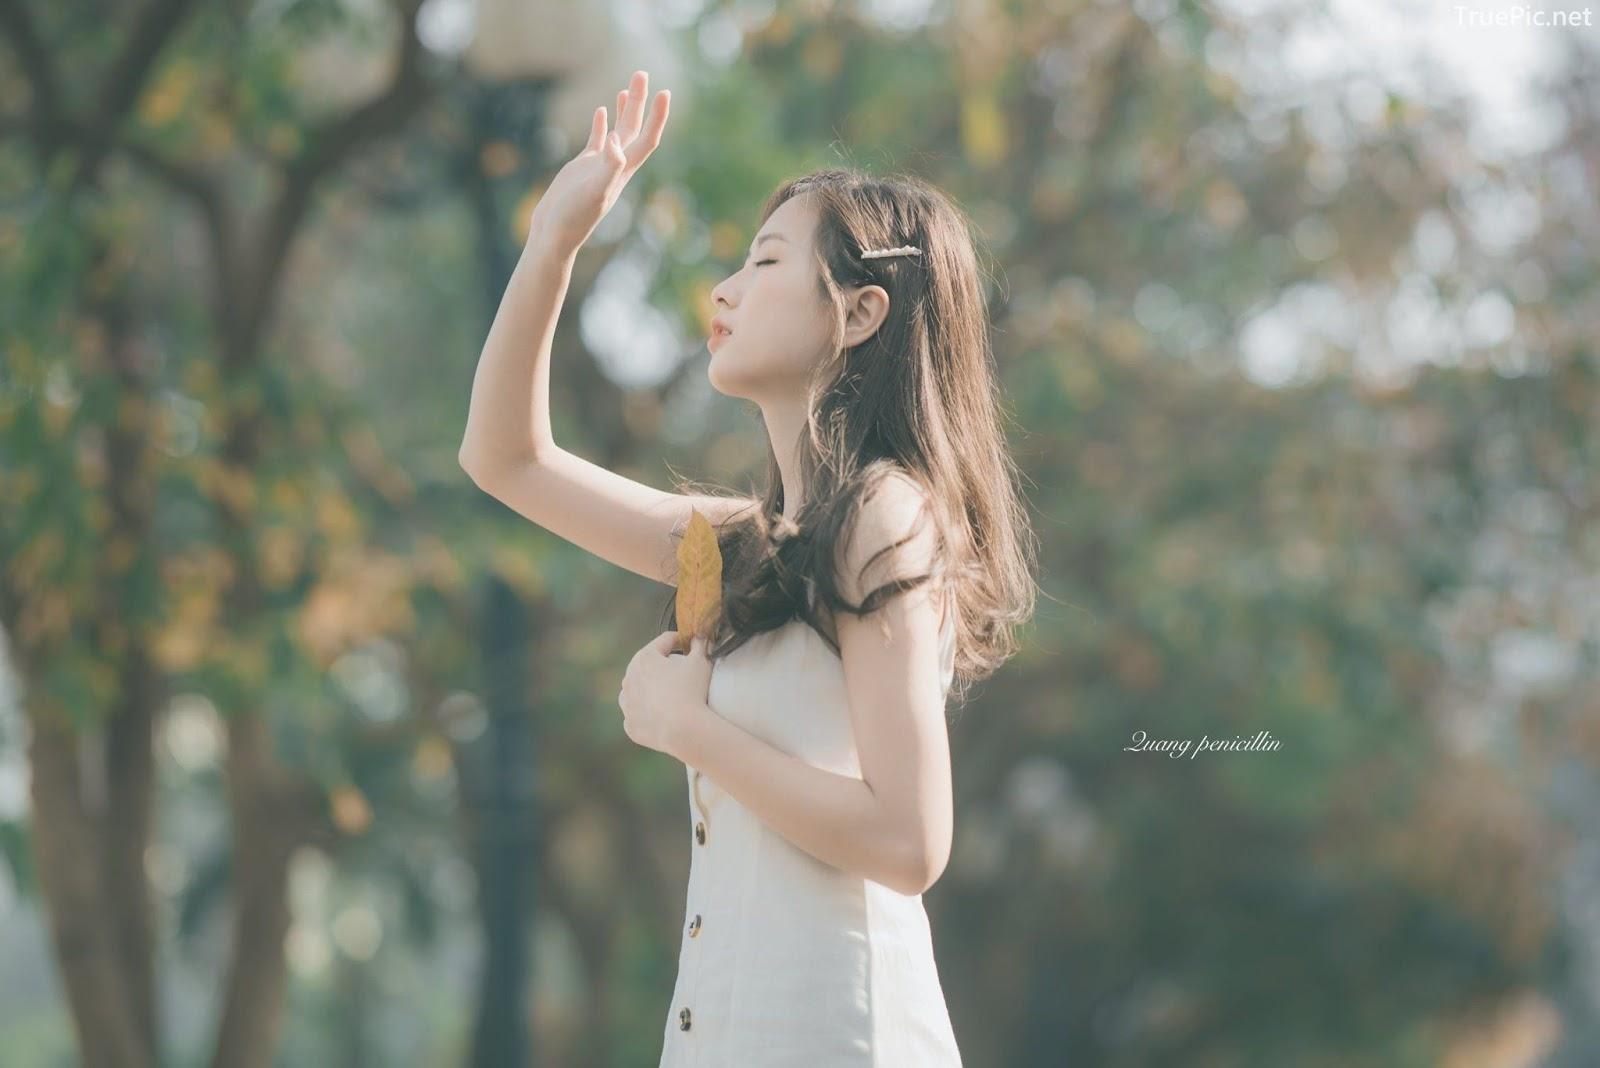 Vietnamese Hot Girl Linh Hoai - Season of falling leaves - TruePic.net - Picture 8